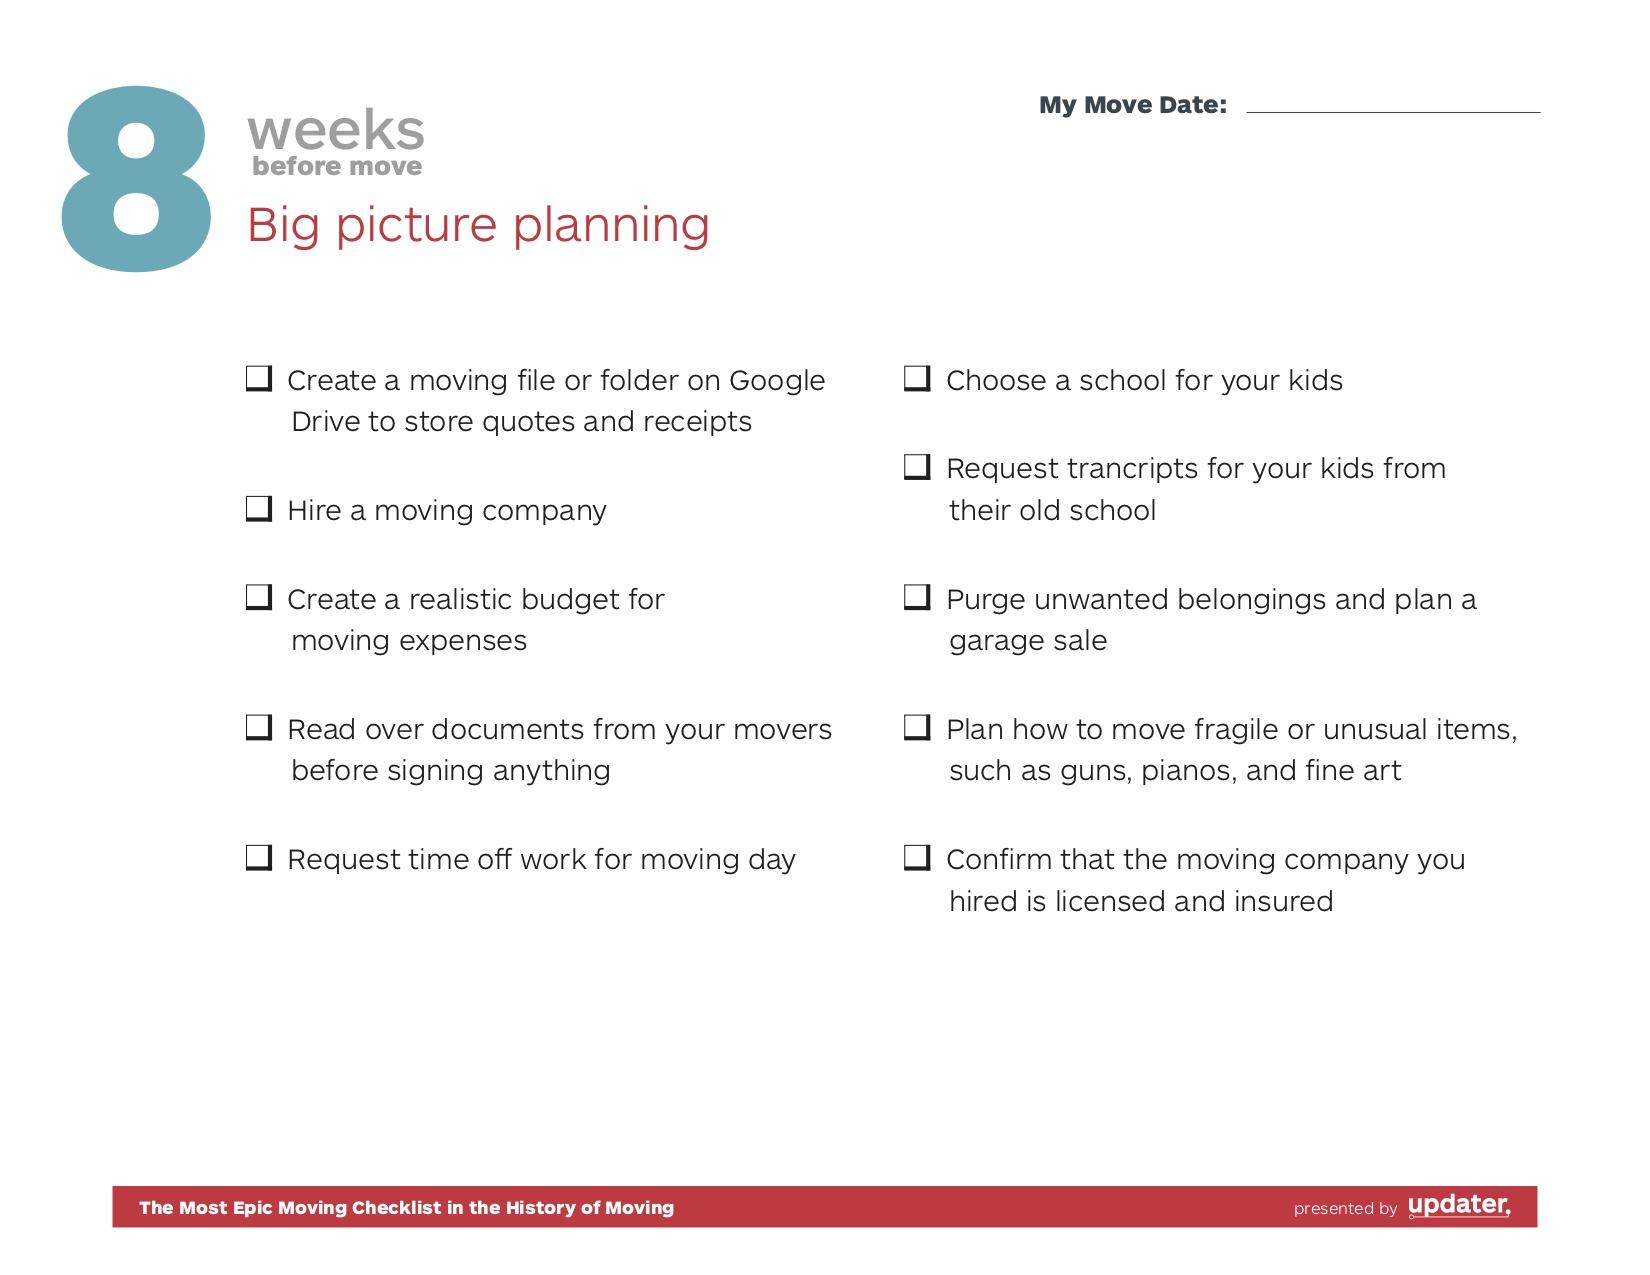 moving-checklist-8wks.jpg